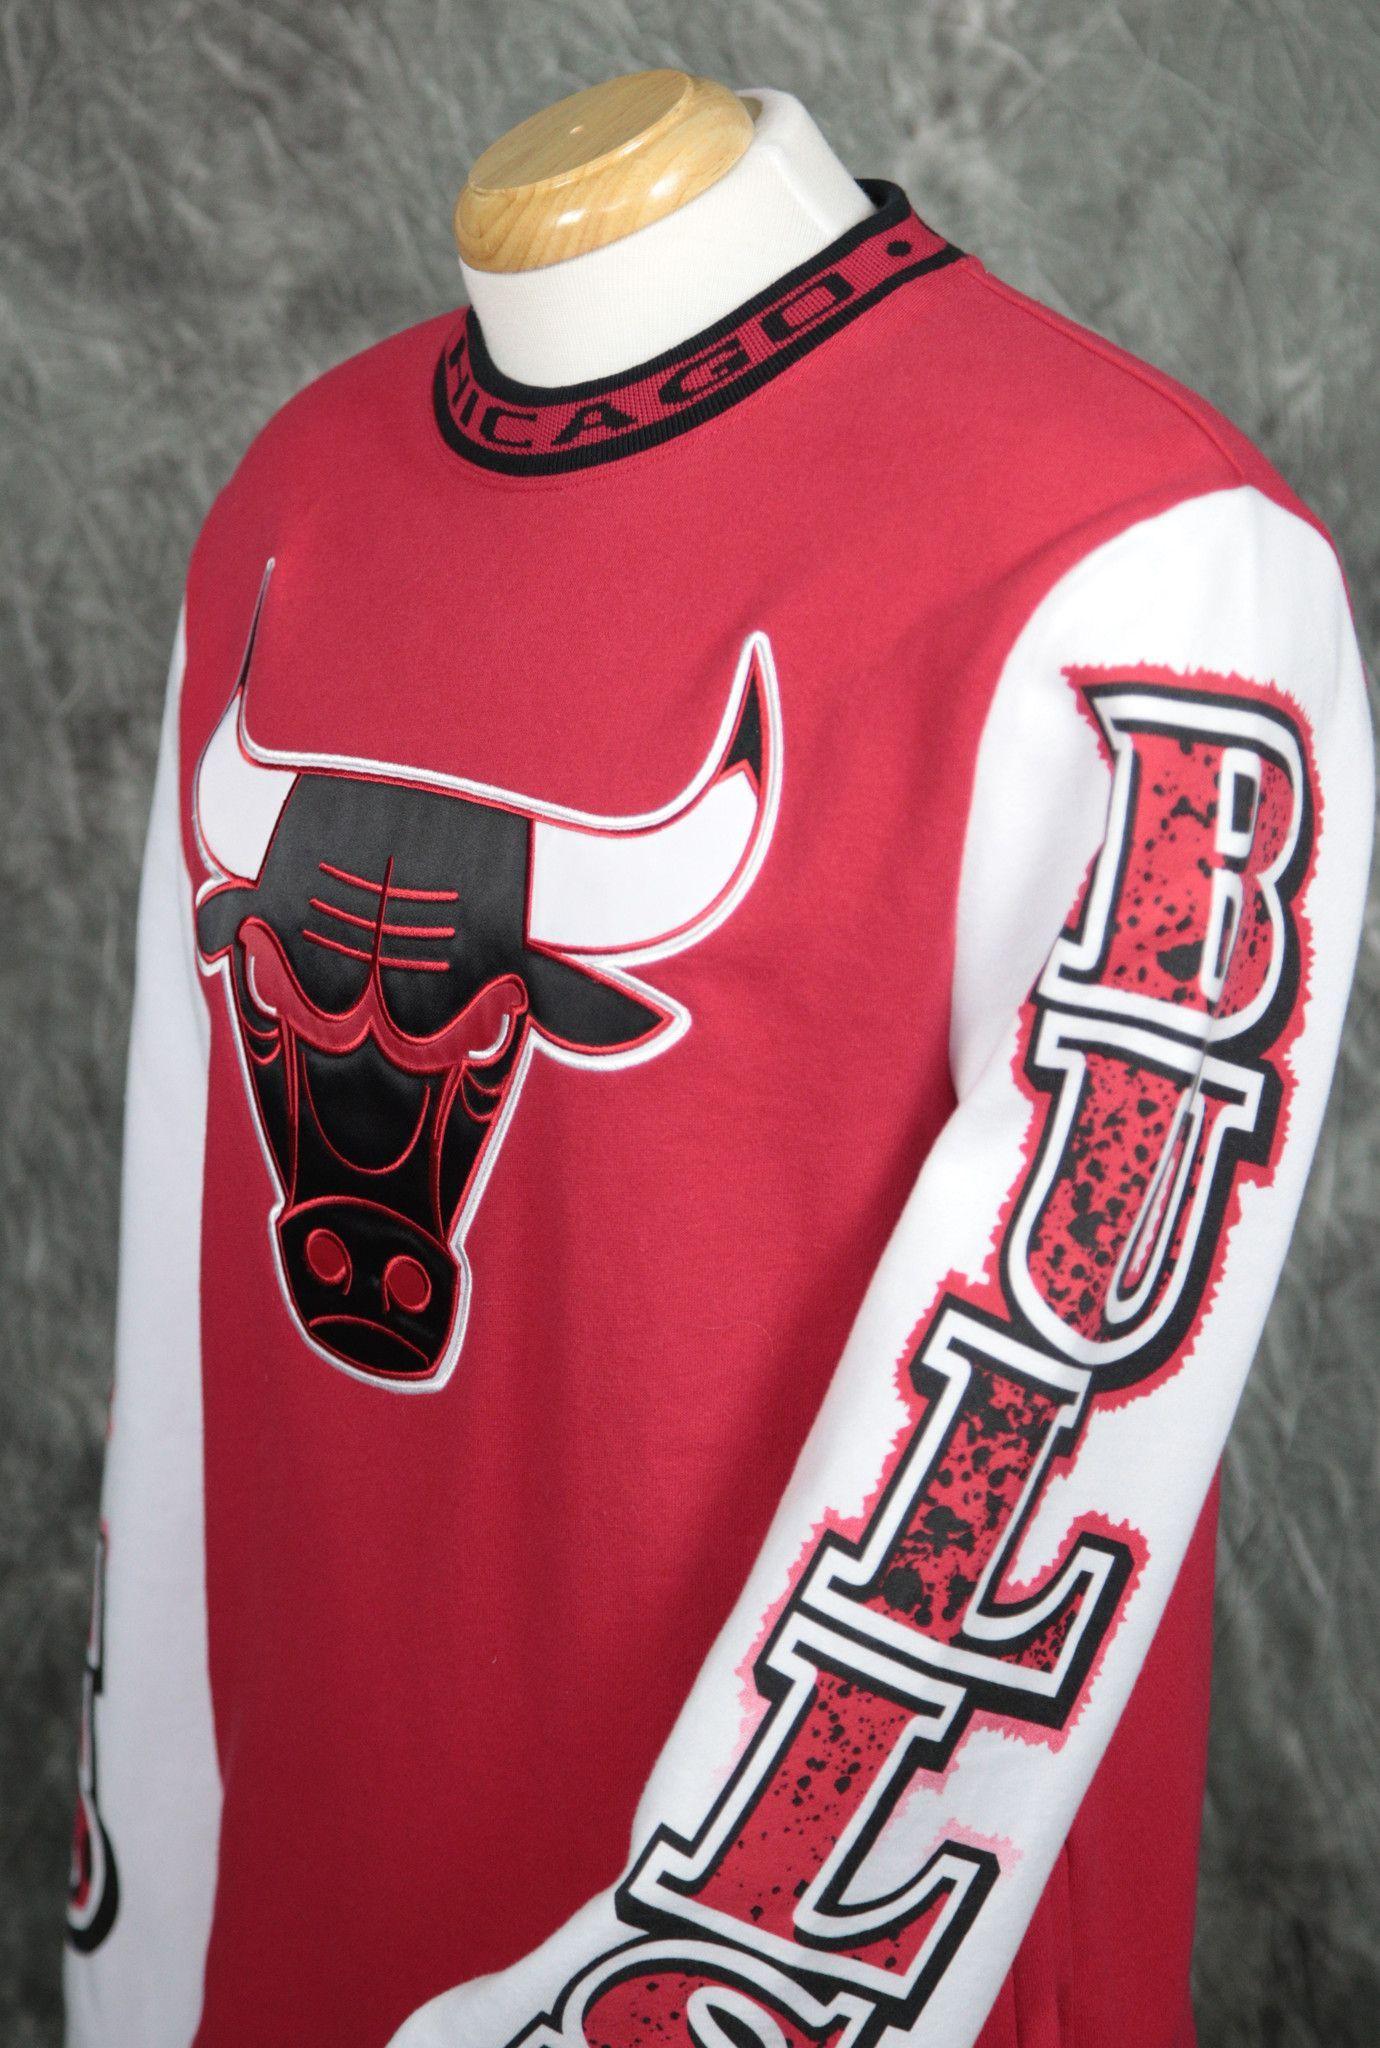 64f651972b786 Chicago Bulls Mitchell   Ness Excessive Celebration Sweatshirt ...